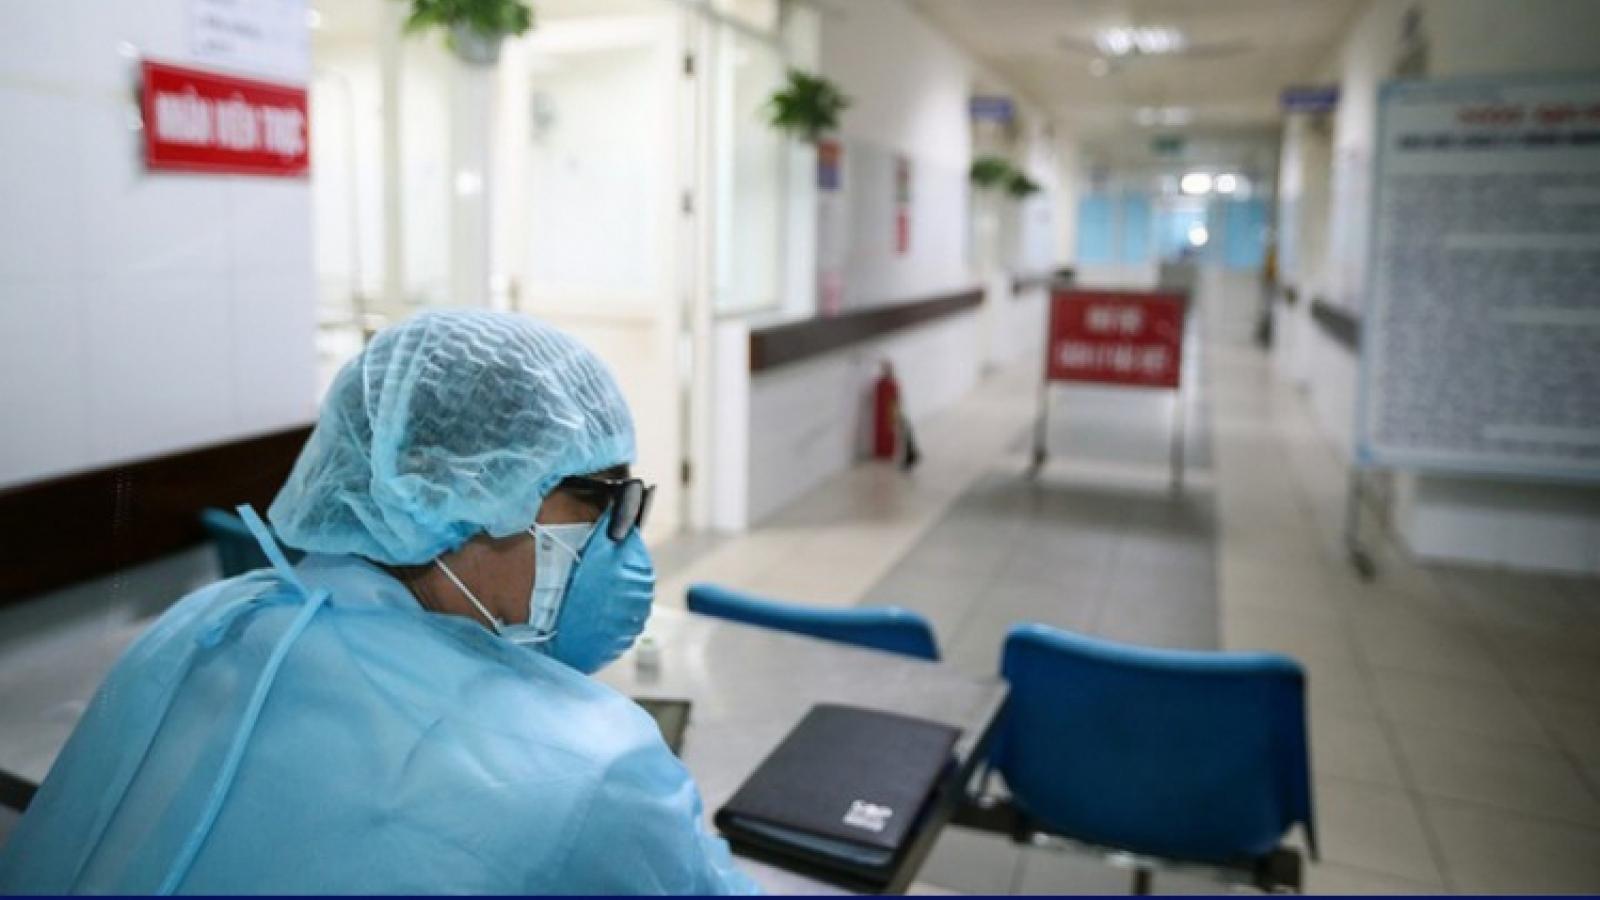 Vietnam told to keep vigilant against COVID-19